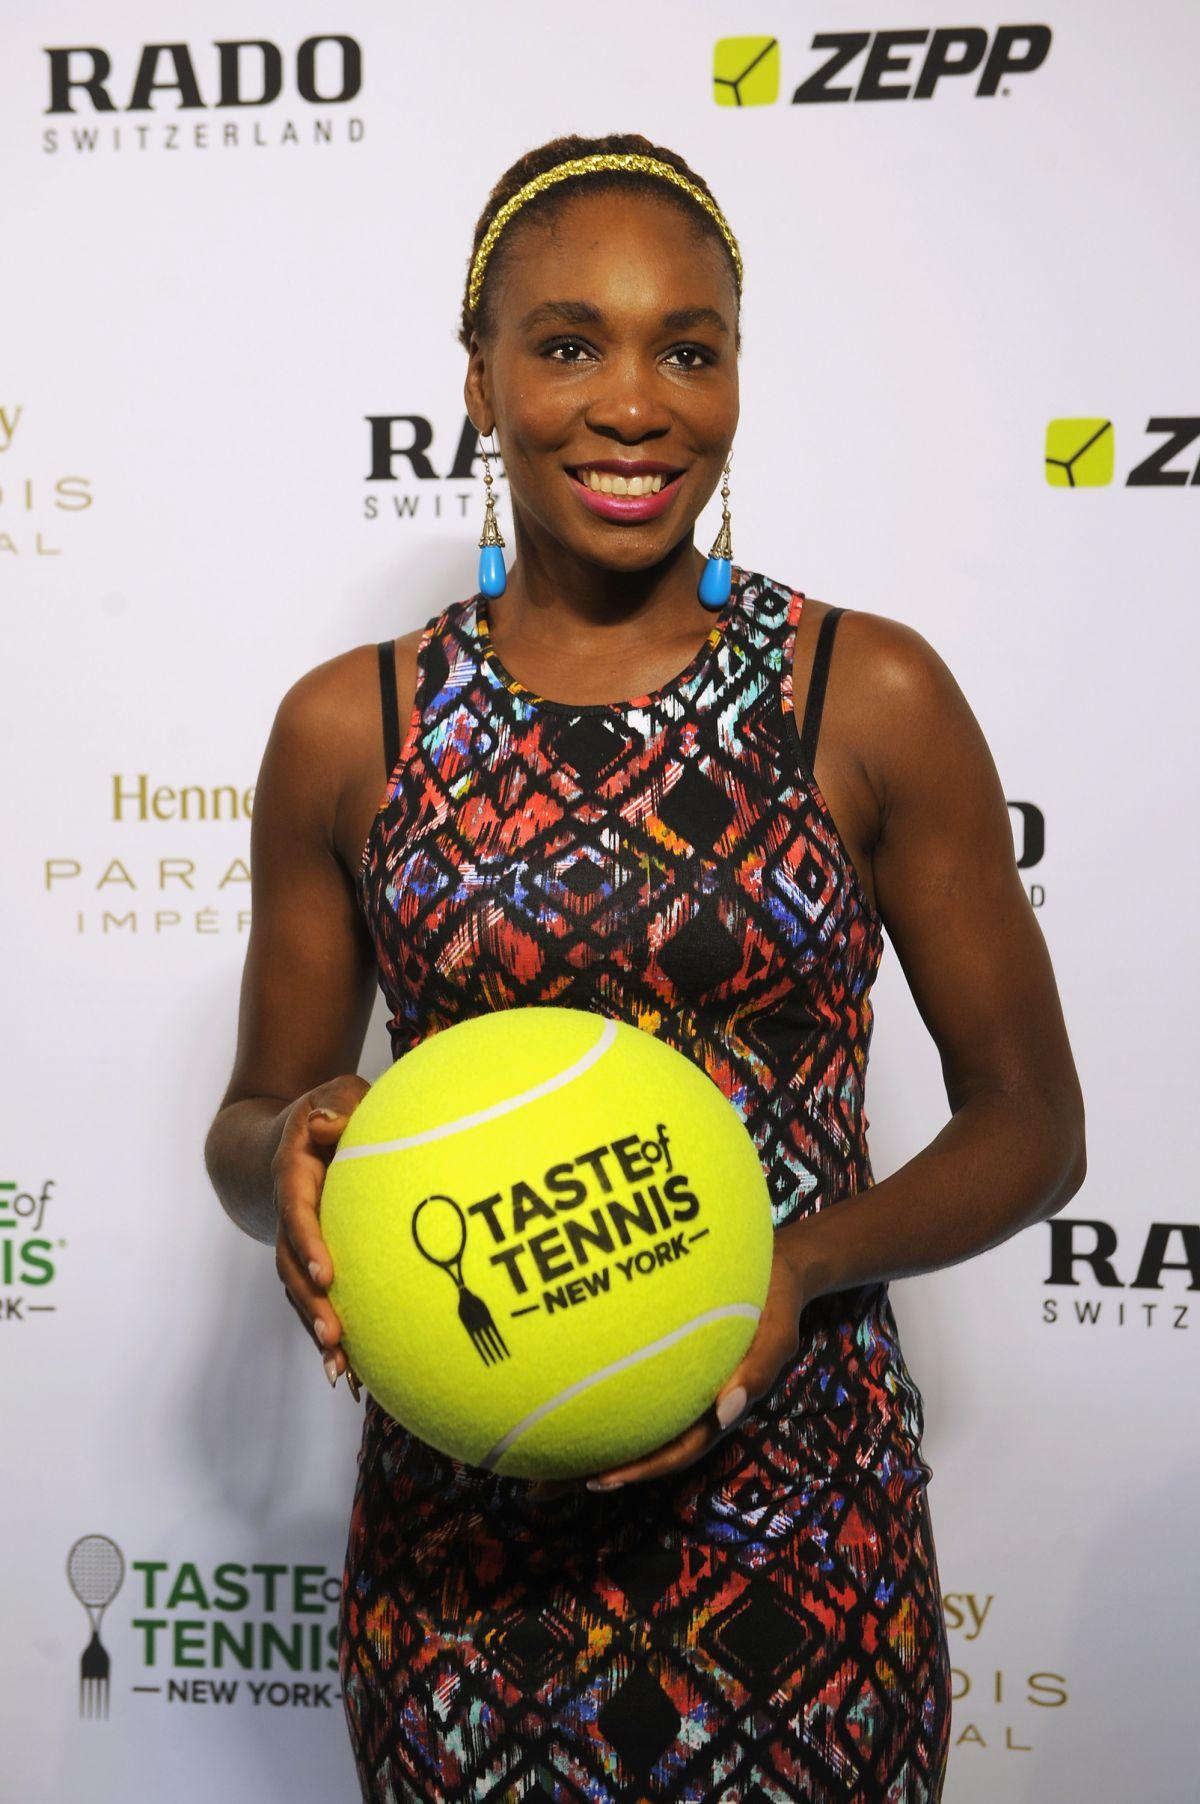 VENUS WILLIAMS at Taste of Tennis Gala in New York HawtCelebs